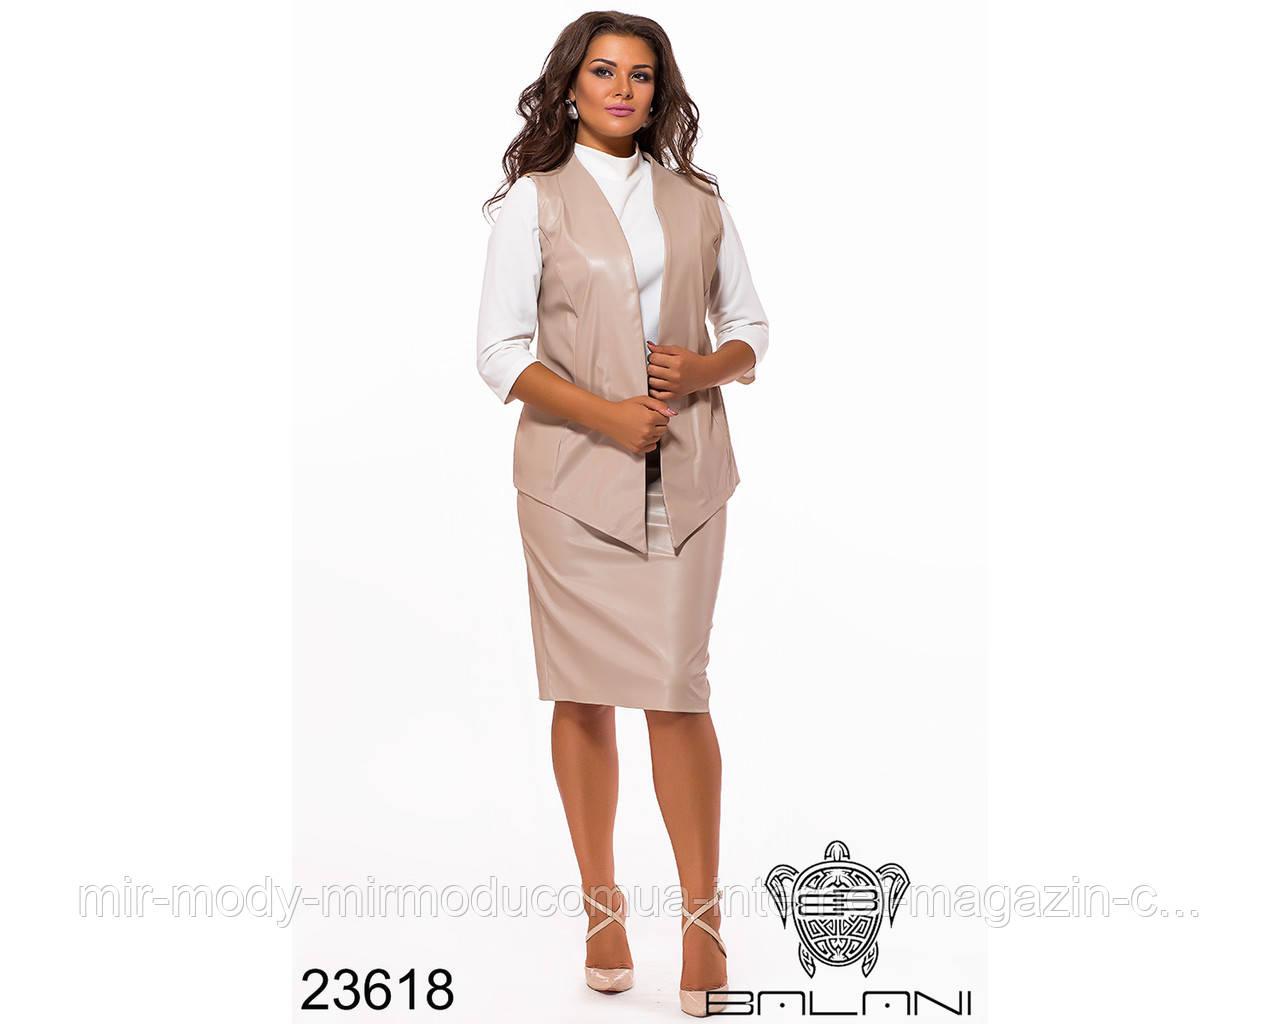 Юбочный костюм тройка- 23618 с 48 по 54 размер(бн)